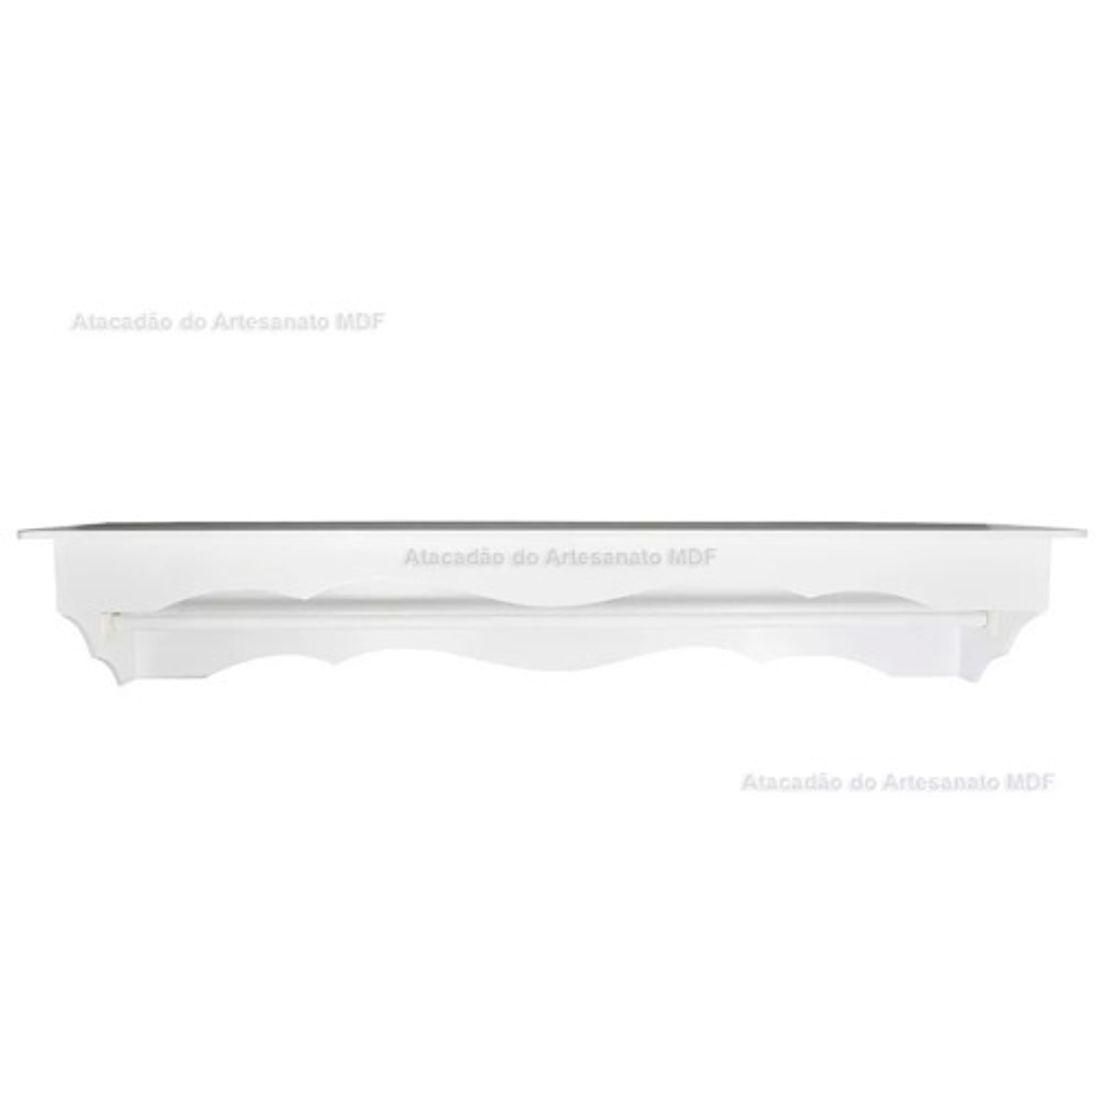 Prateleira-Simples-Ondulada-Com-Varao-Pintado-90x17x17